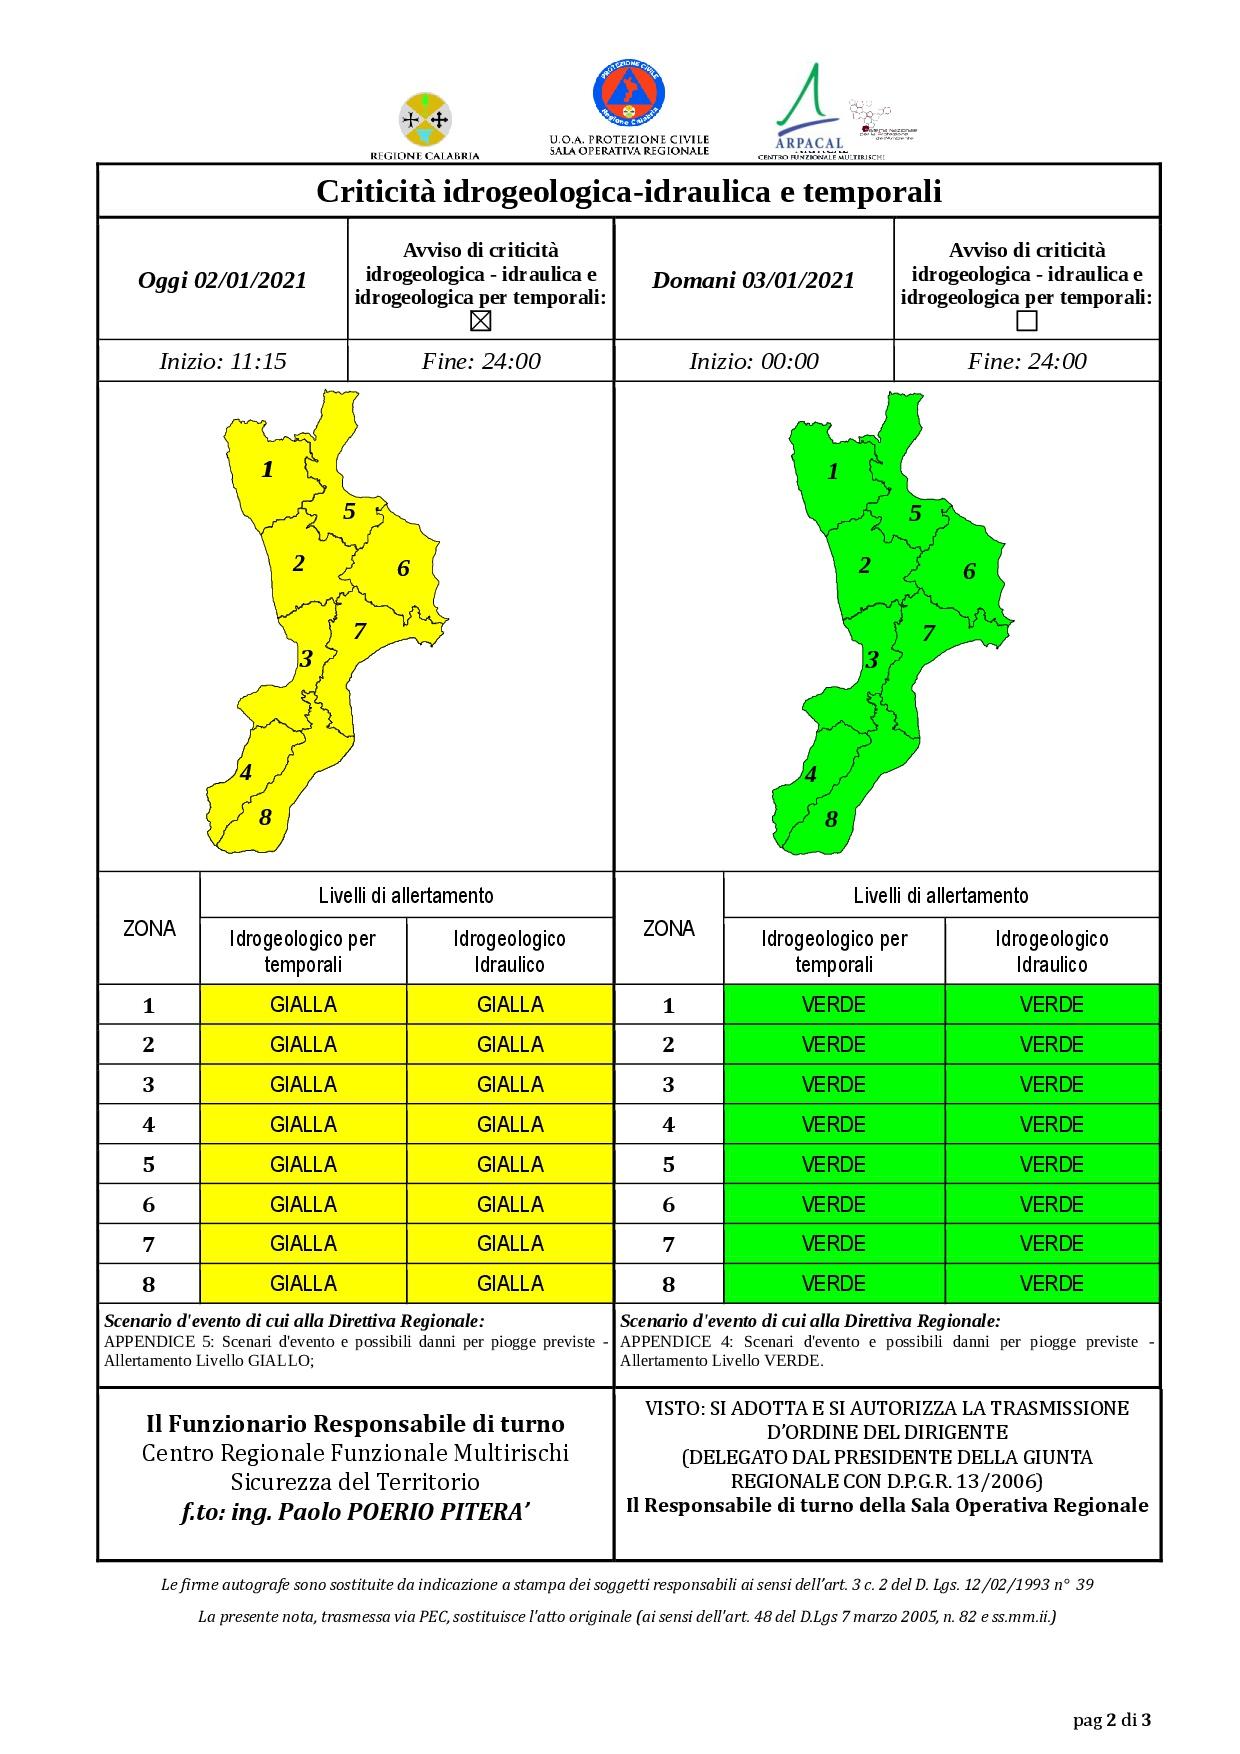 Criticità idrogeologica-idraulica e temporali in Calabria 02-01-2021